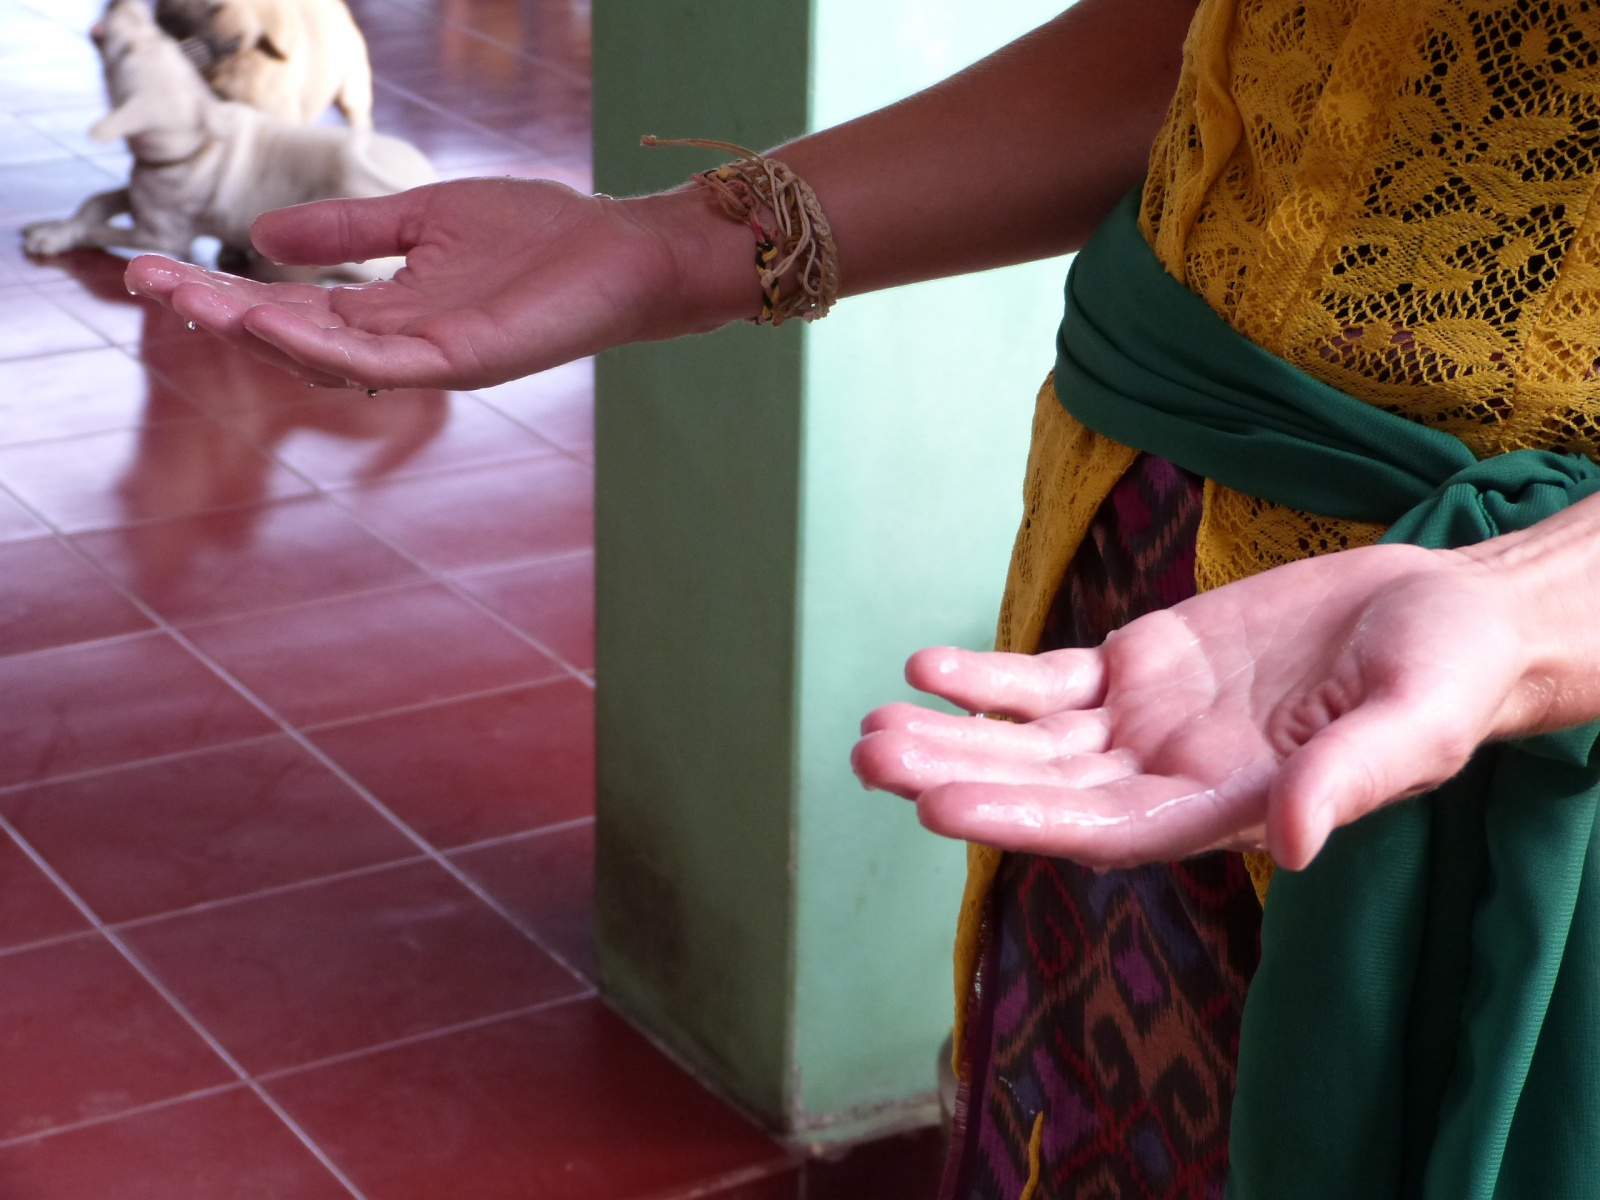 Rianne Wijninge Aards en Hemels intuïtieve massage